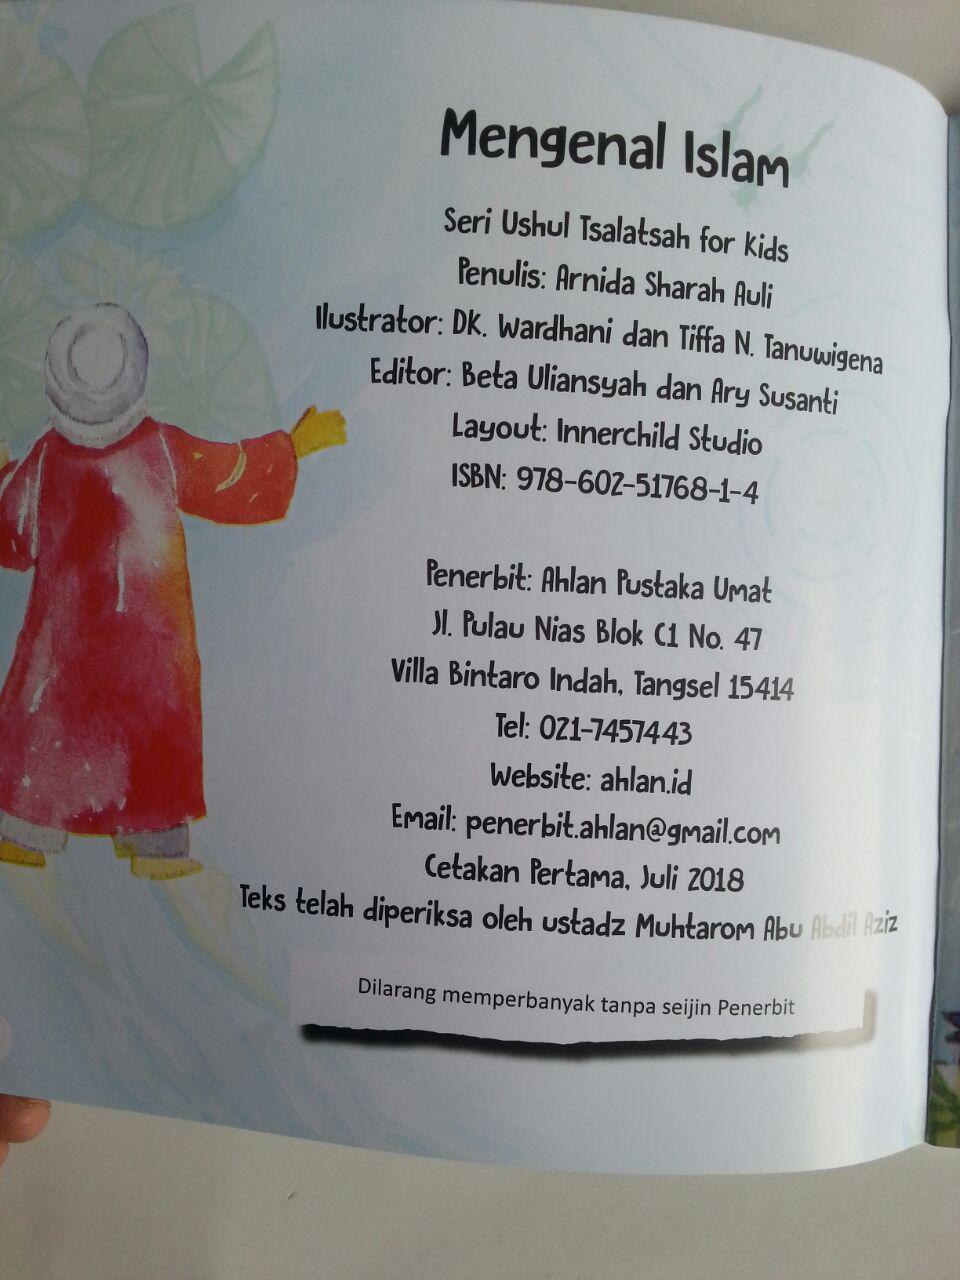 Buku Anak Ushul Tsalatsah For Kids Mengenal Islam isi 2